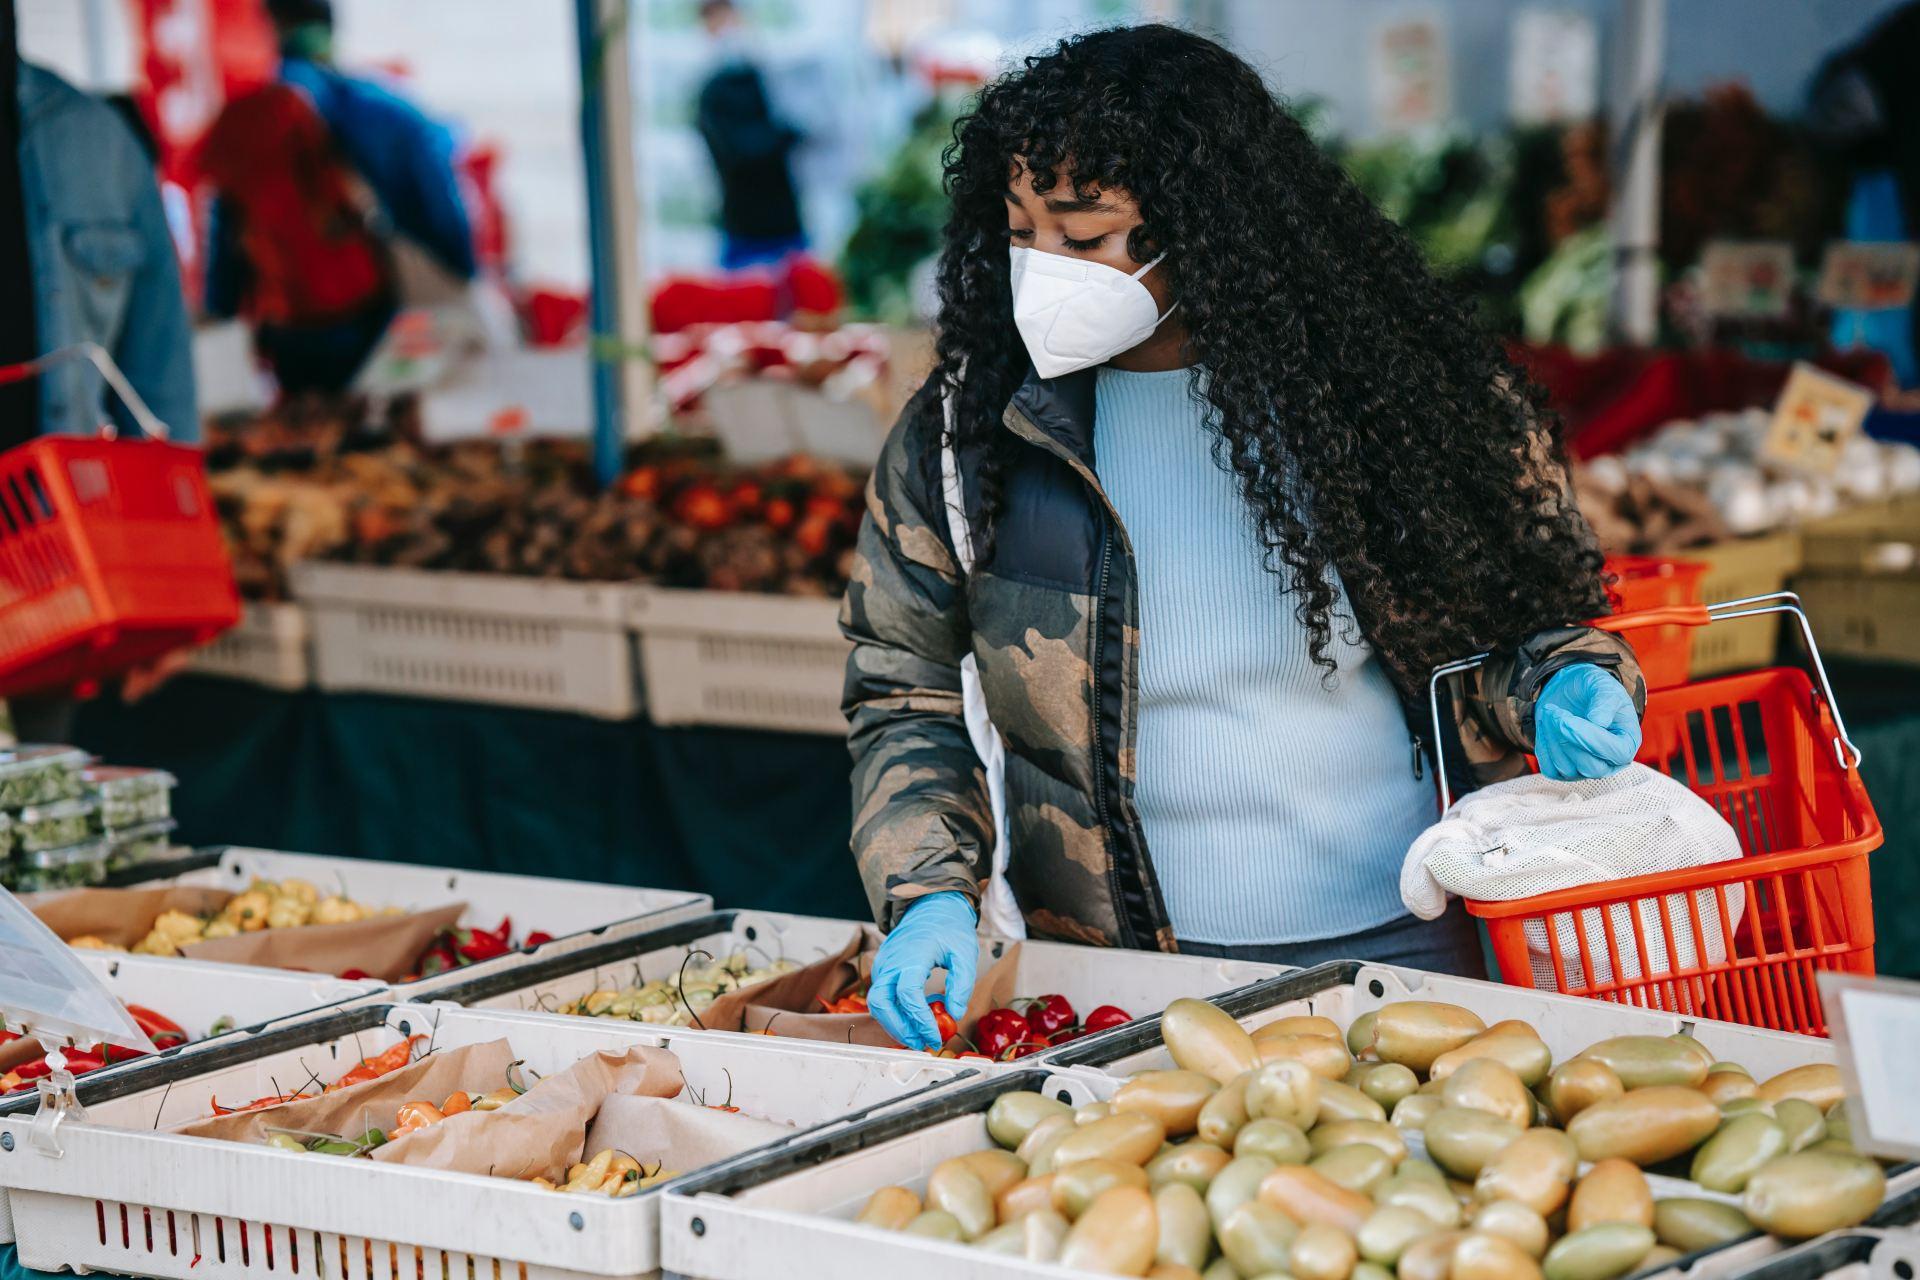 Woman wearing a mask at a market